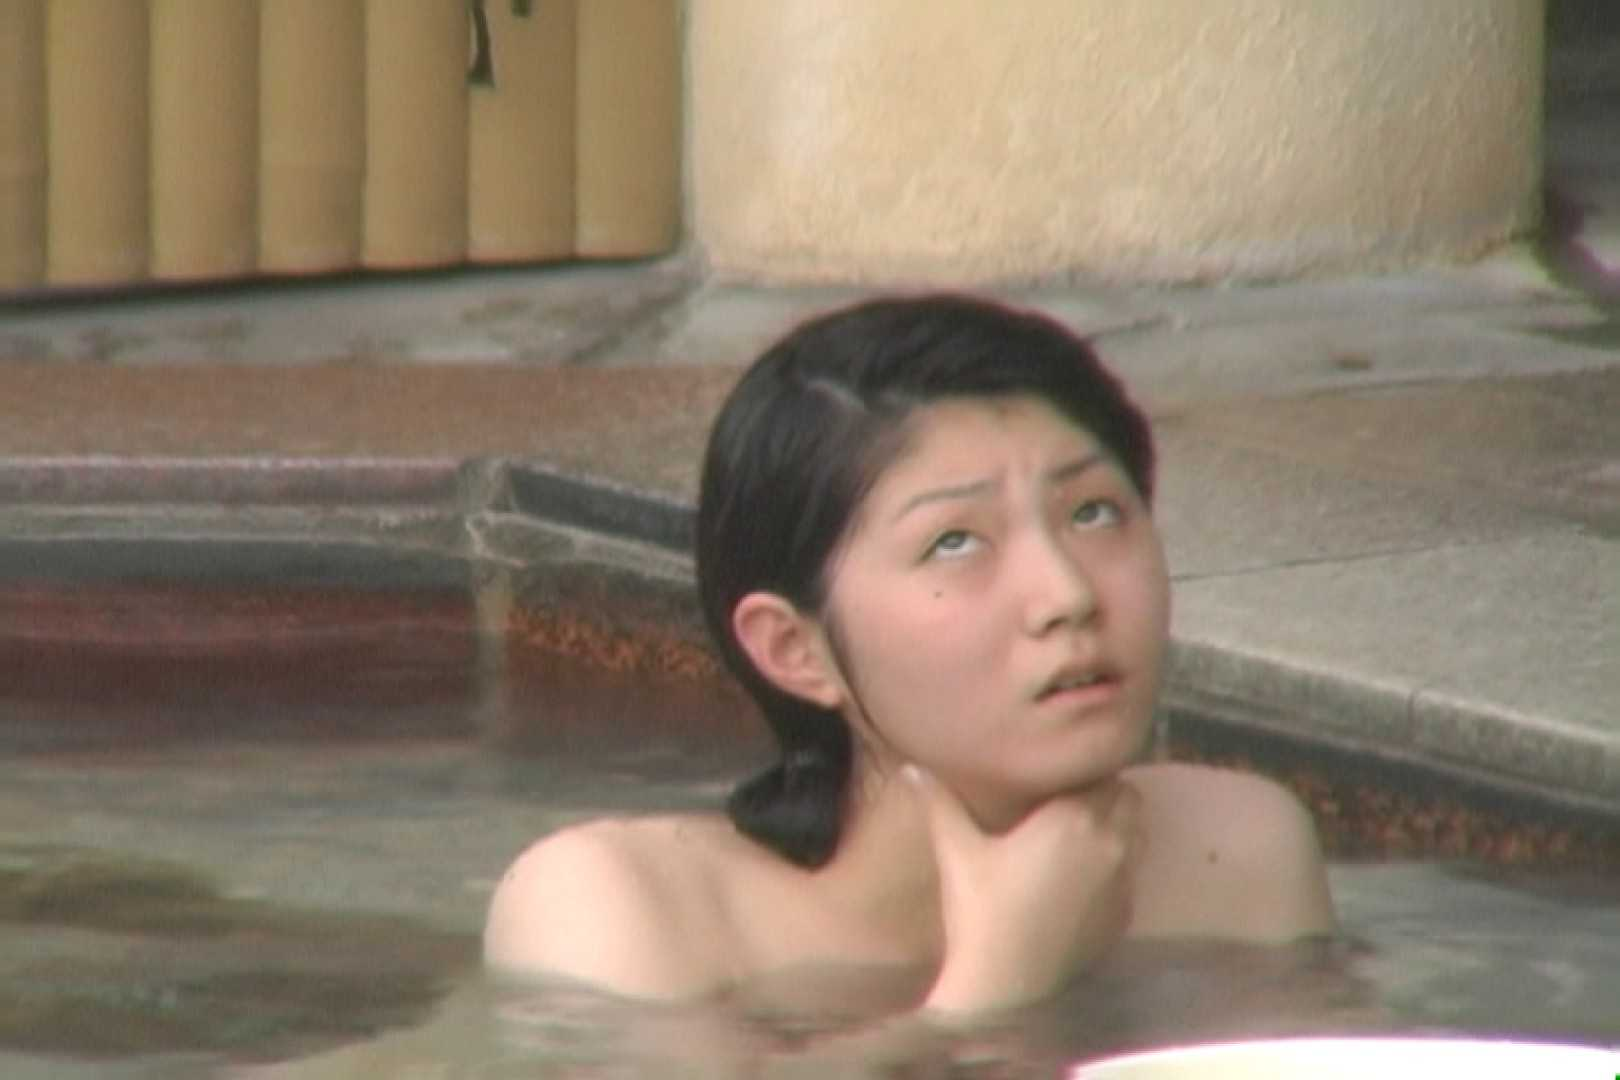 Aquaな露天風呂Vol.579 盗撮 AV無料 52画像 26